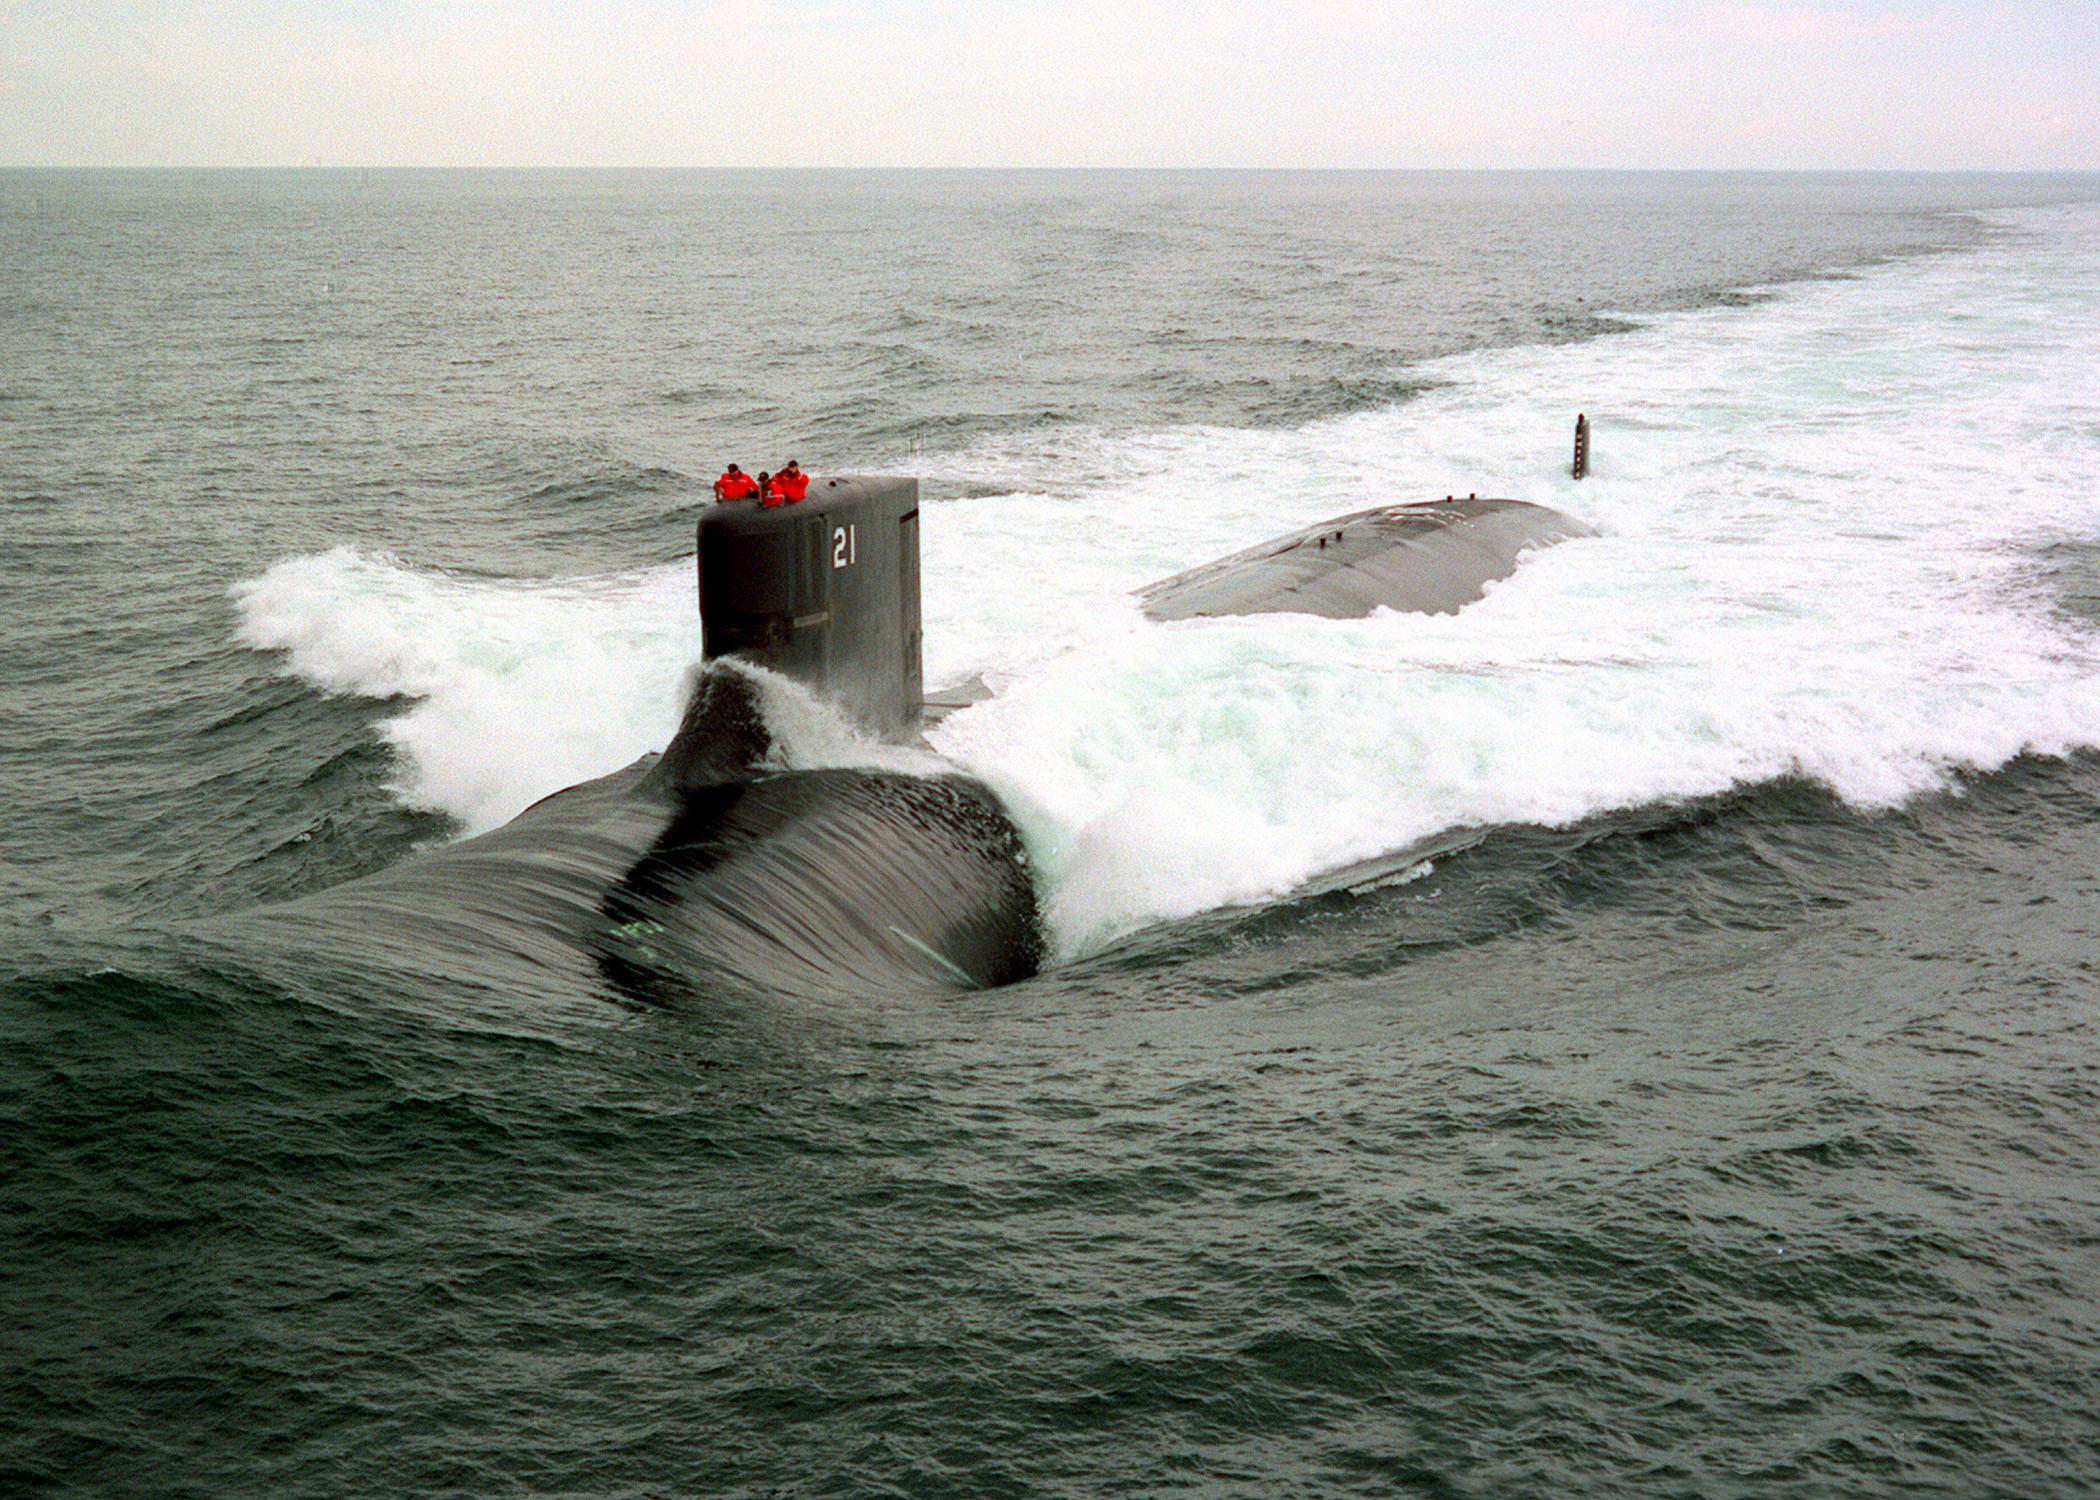 960916-V-0000B-009_USS_Seawolf_at_Sea.jp